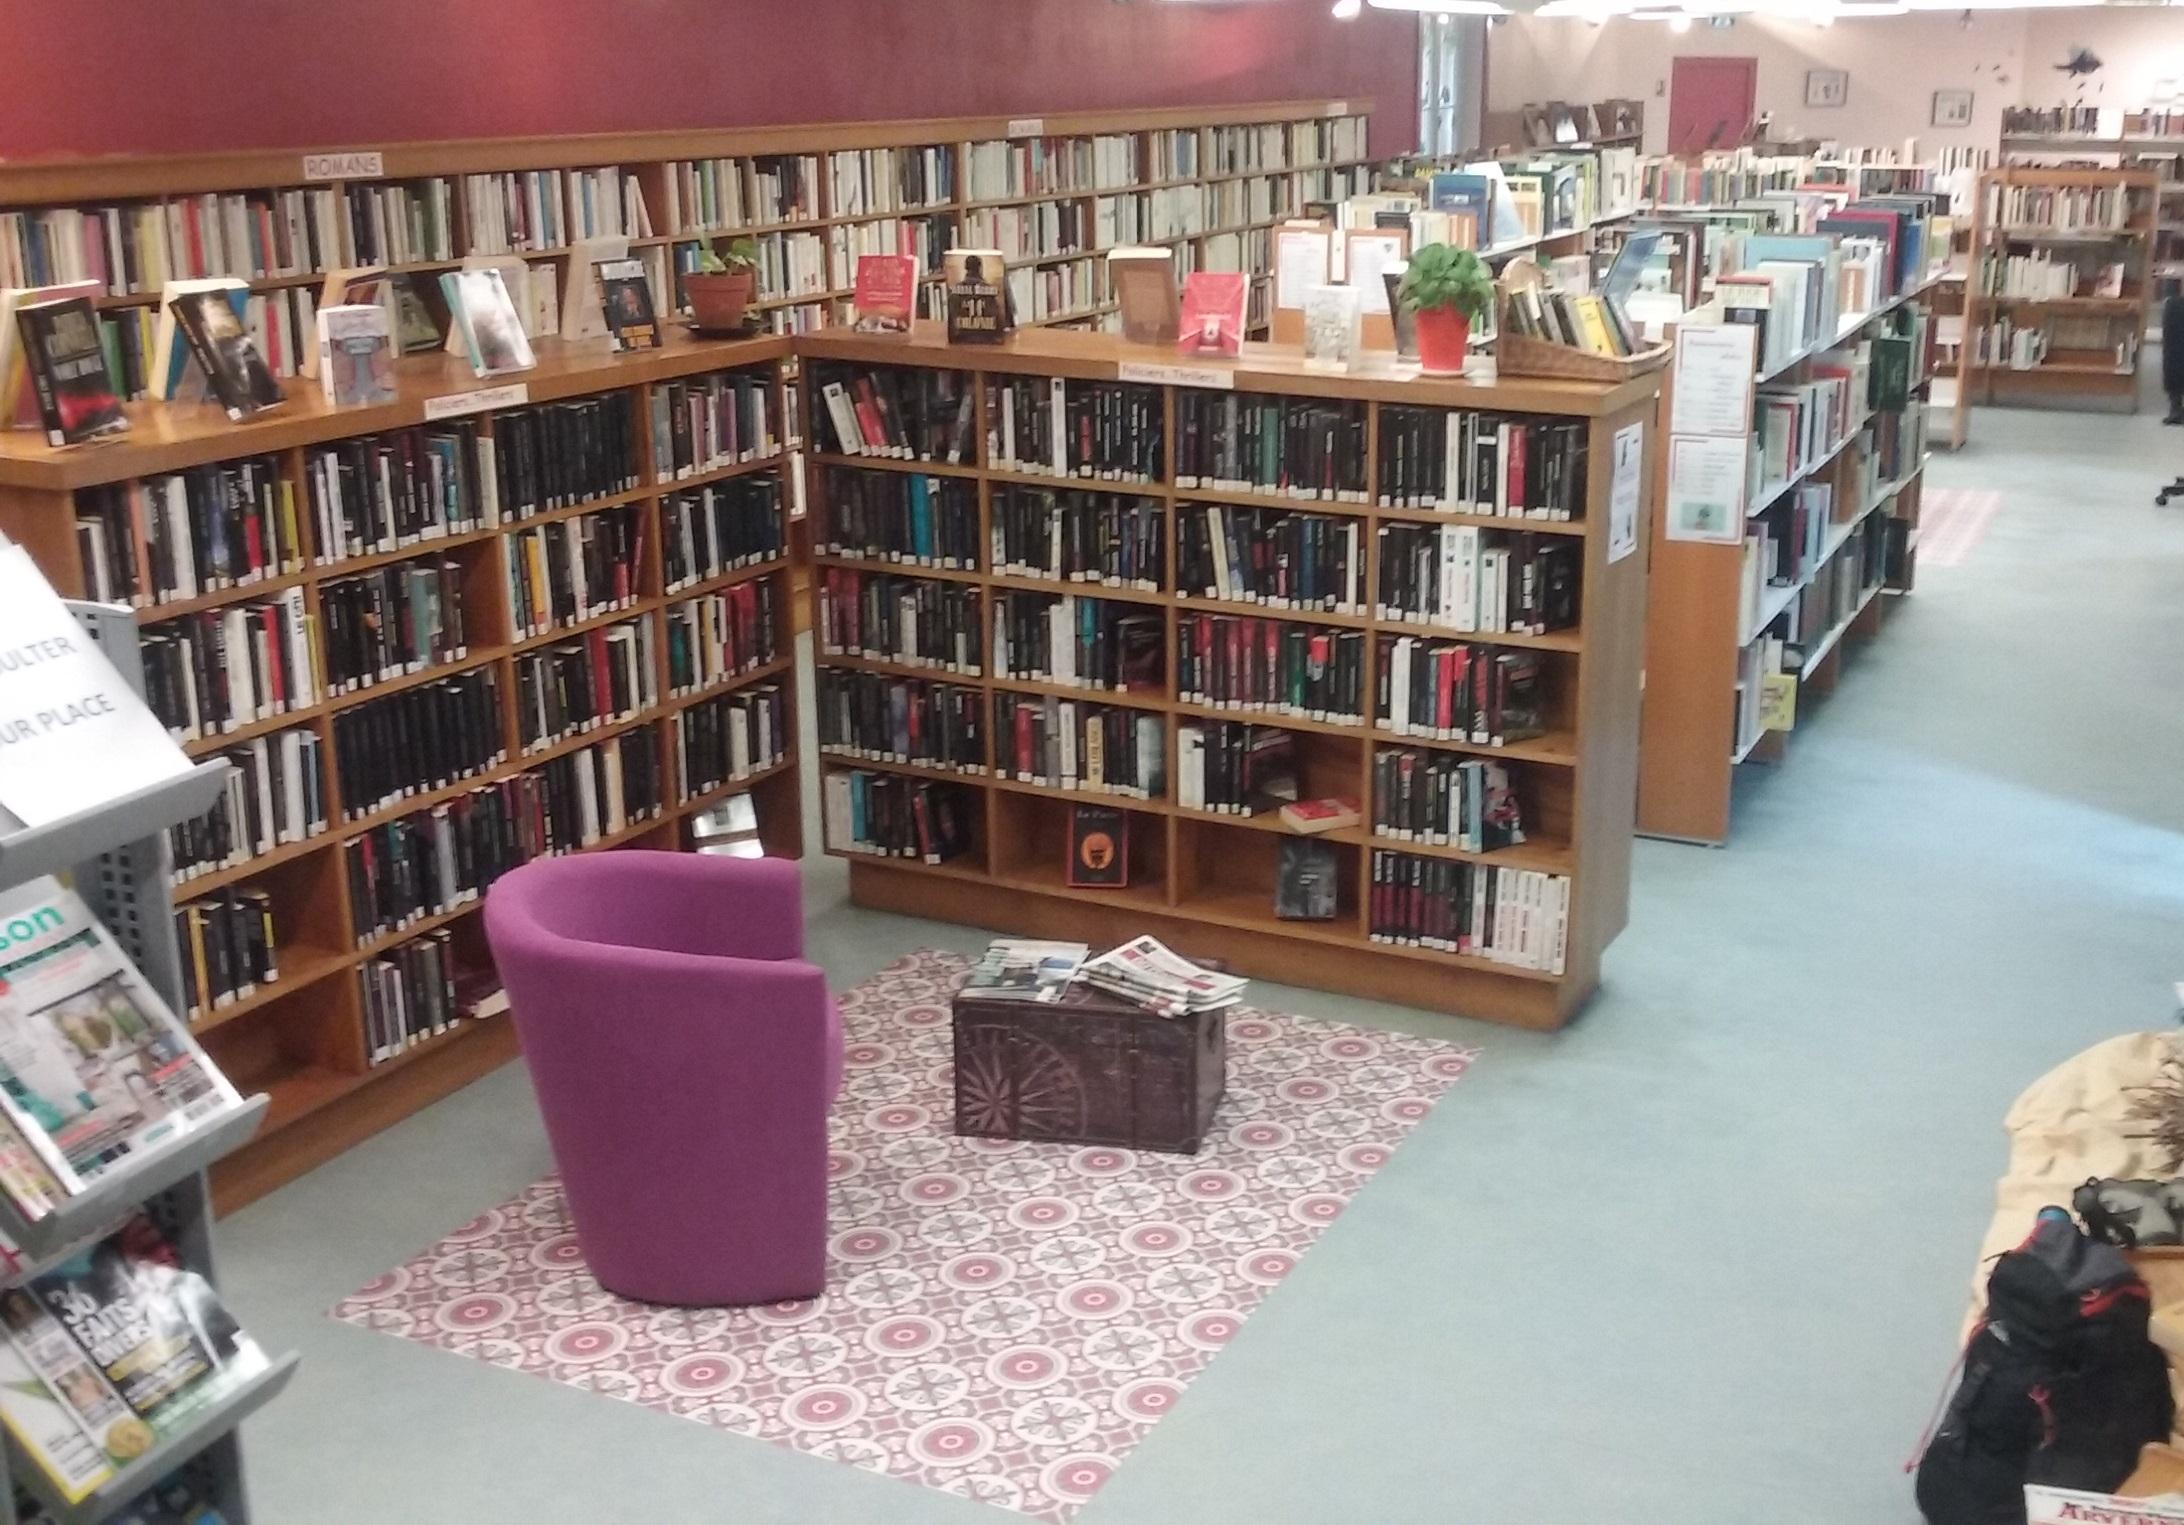 Bibliotheque Varennes Vauzelles